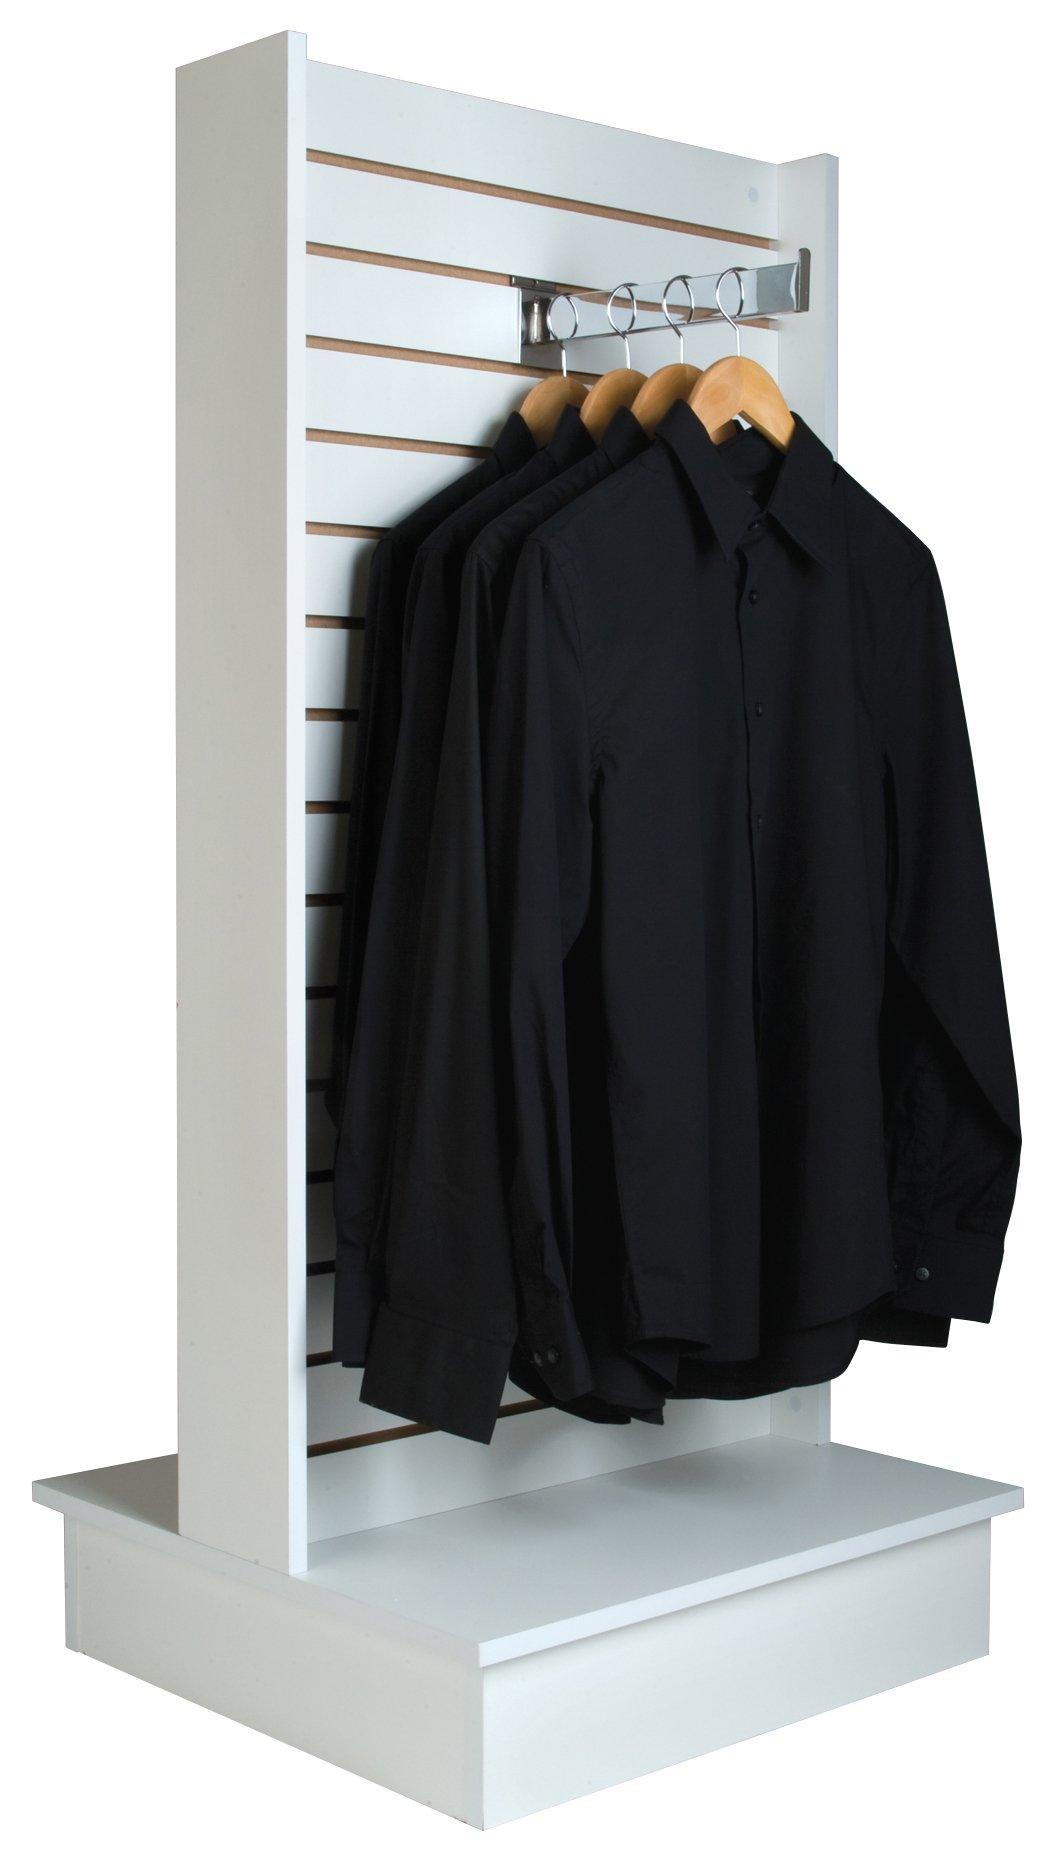 Econoco White Merchandiser for Shelves and Baskets - 2-Way Slatwall Merchandiser, For Heavy Duty Shelves, 25.5'' x 24'' x 54'', Slatwall Panel, Clothing Slatwall, White